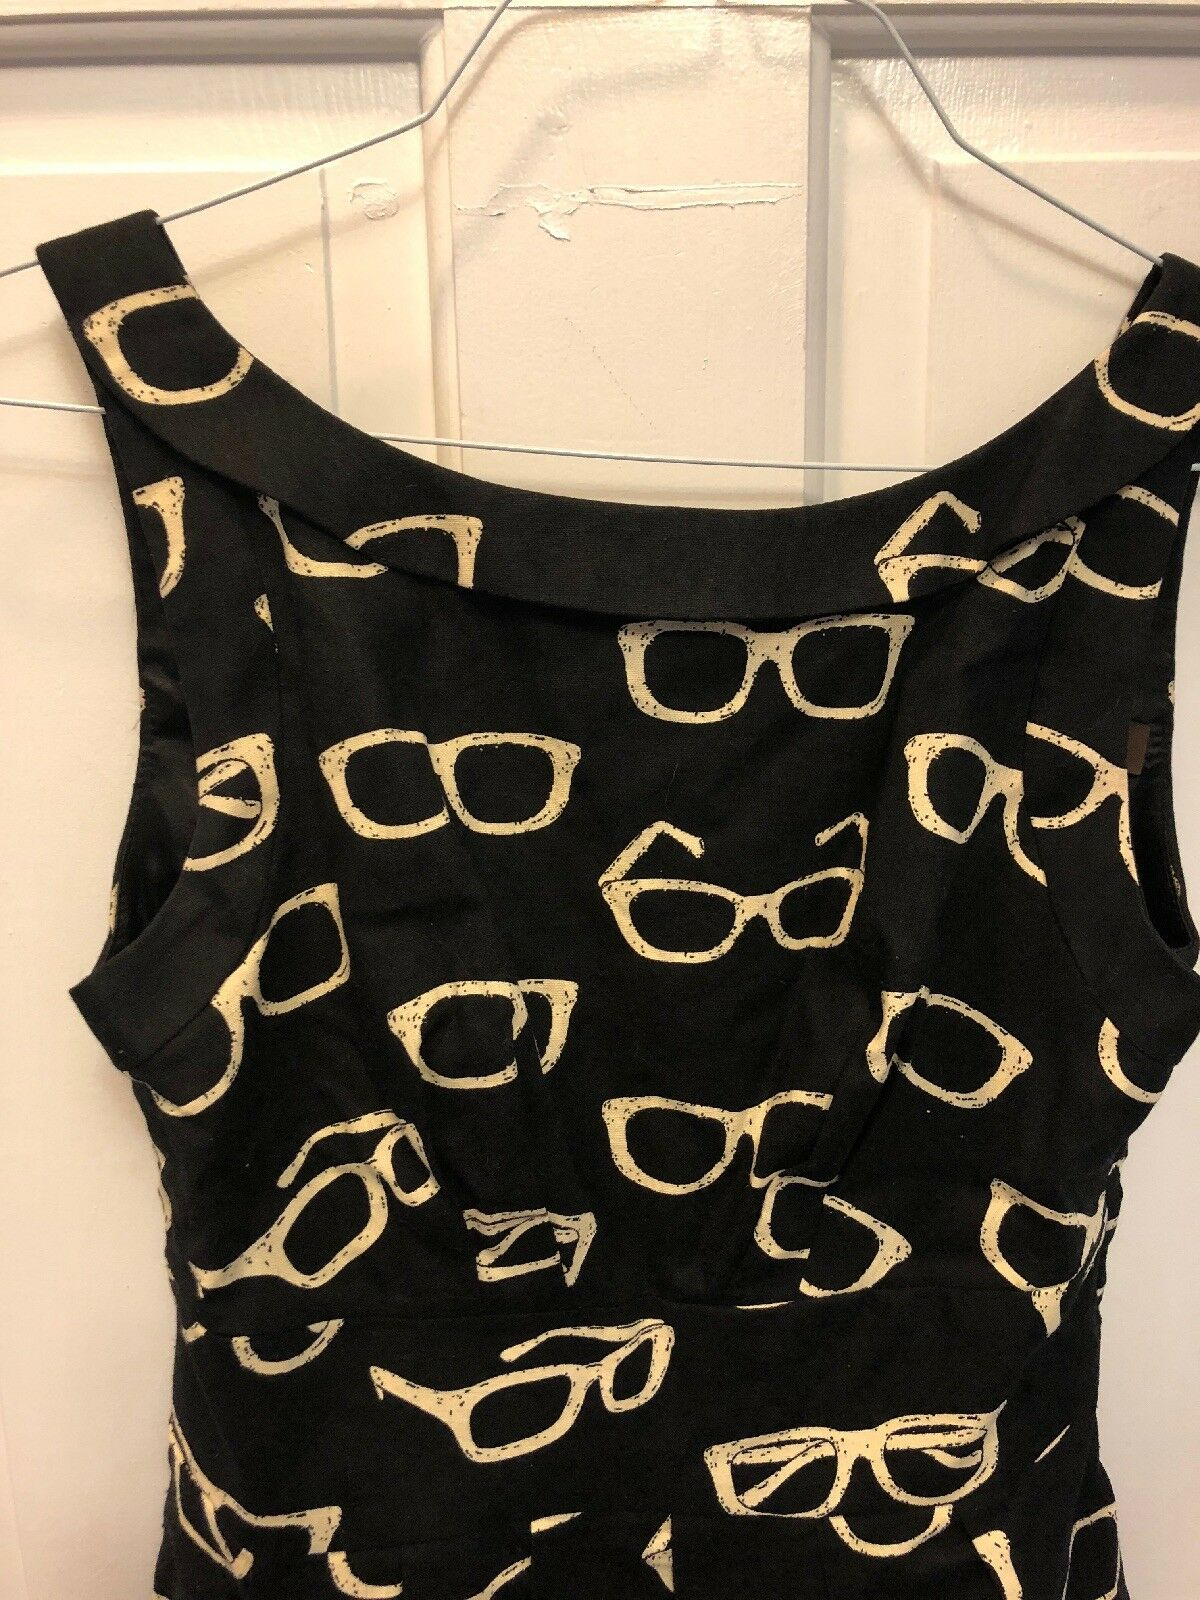 Anthropologie Eva Eva Eva Franco Glasses Addison Dress Size 2 New 949563